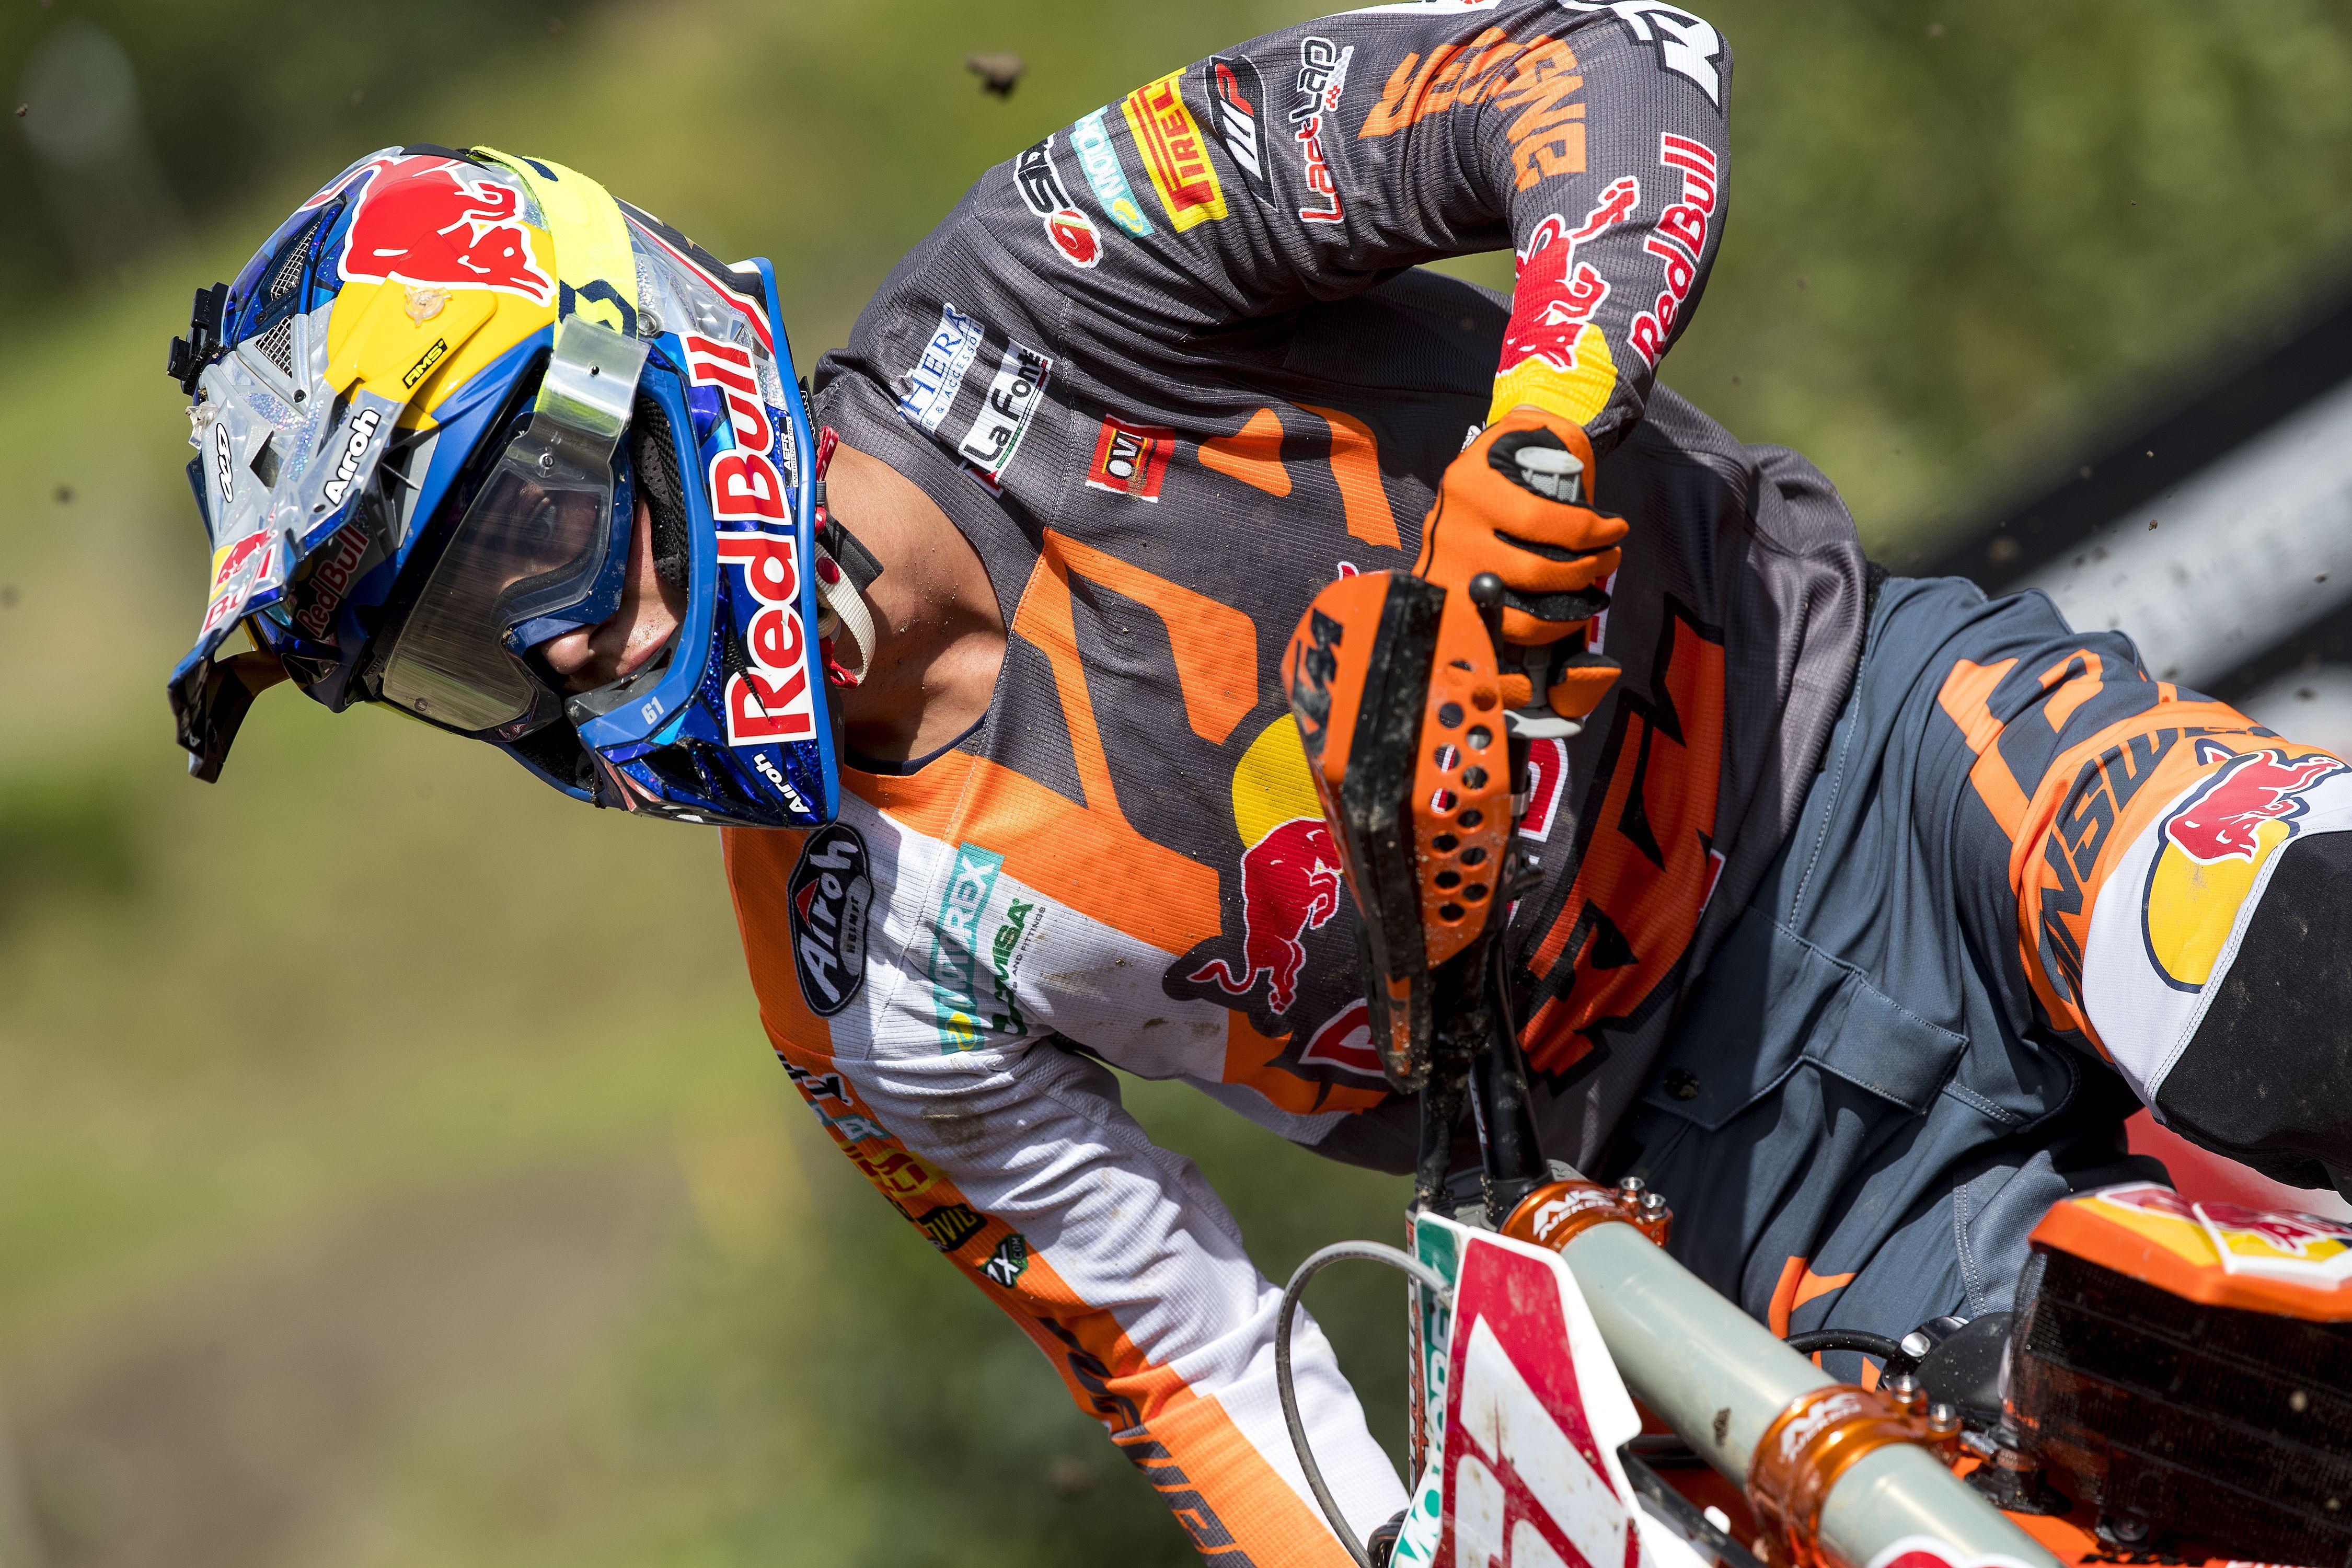 MX2 world champion Jorge Prado undergoes surgery for left femur